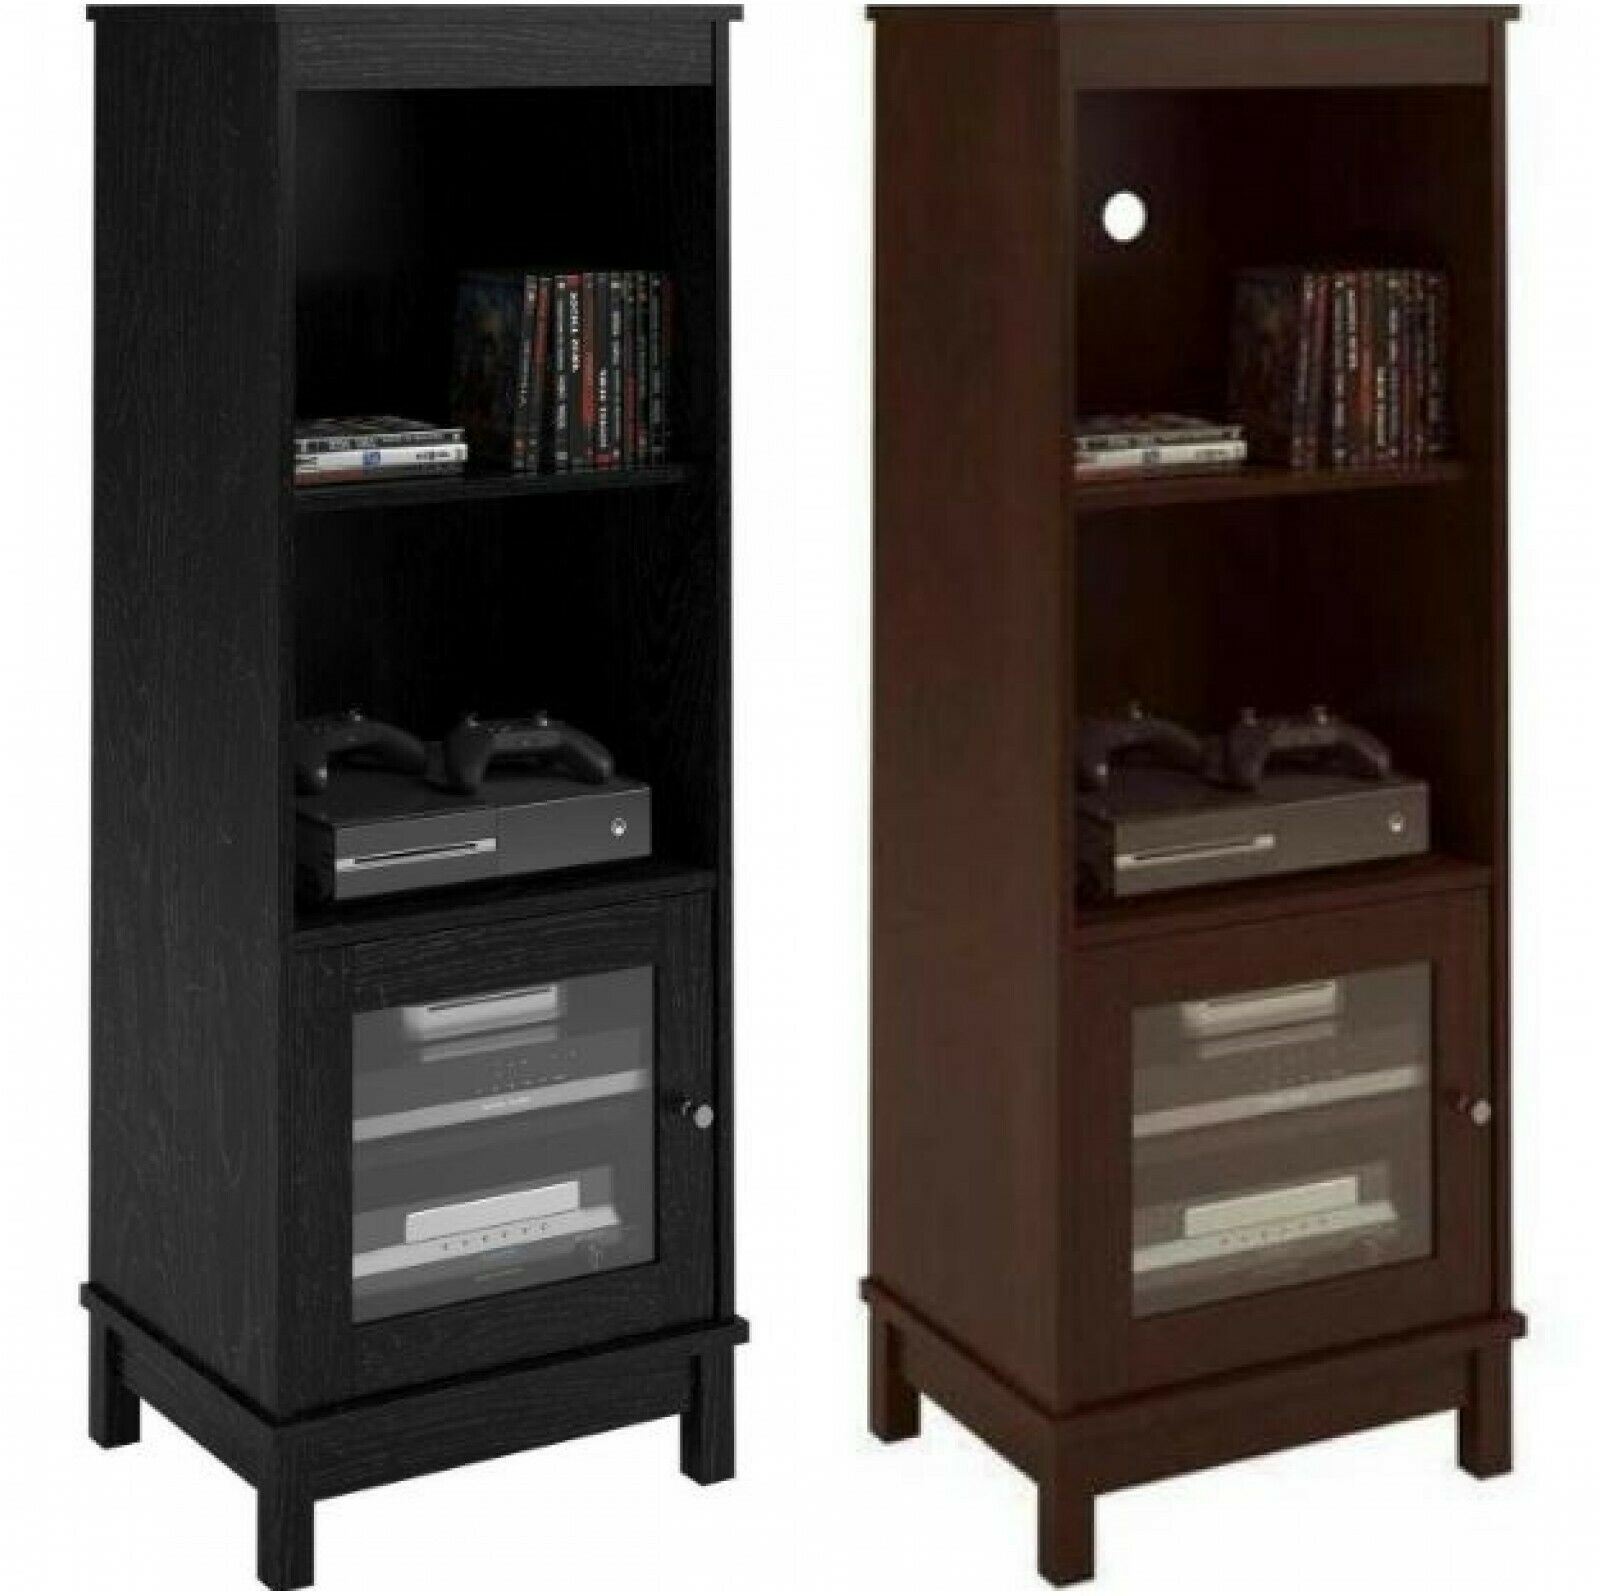 Media Center Bookcase Cabinet Wire Hole Door Furniture Audio